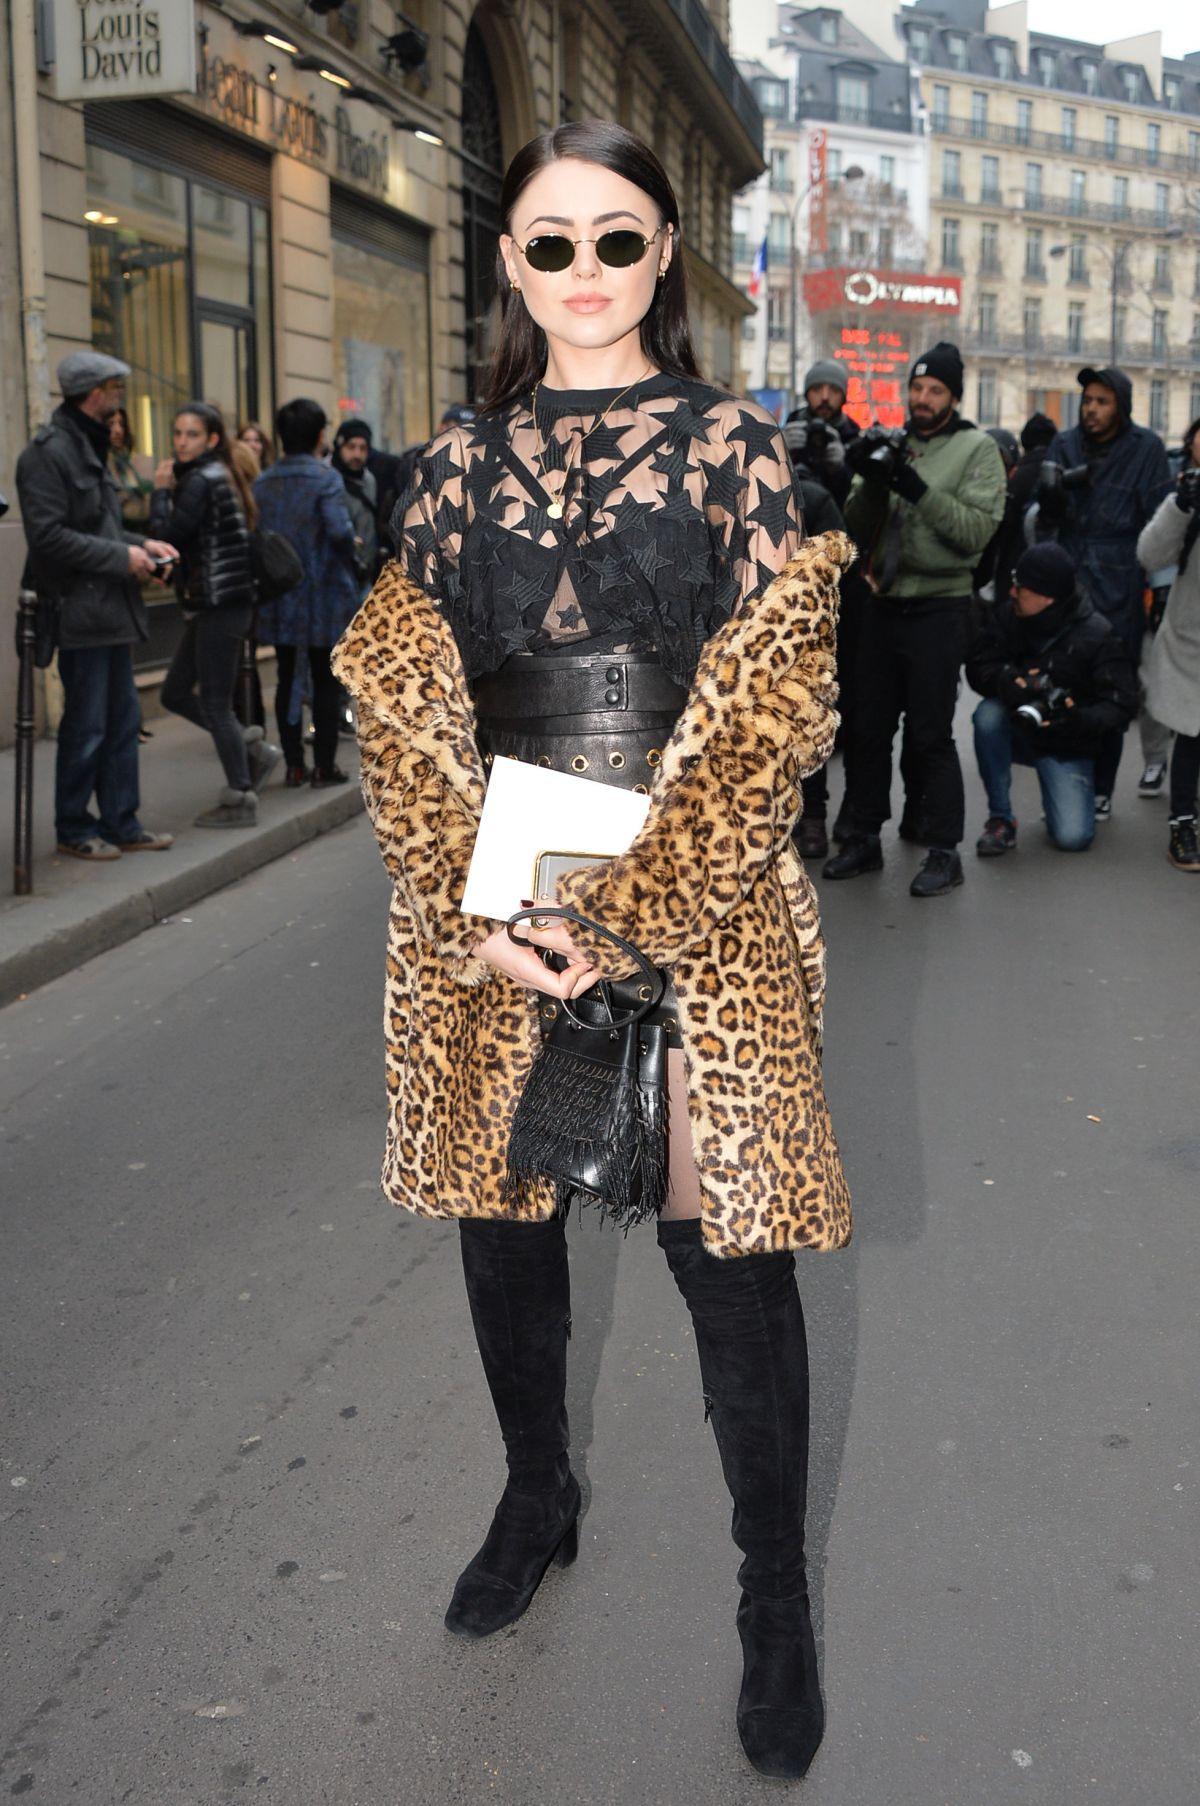 KRISTINA BAZAN at Elie Saab Fashion Show in Paris 01/25/2017